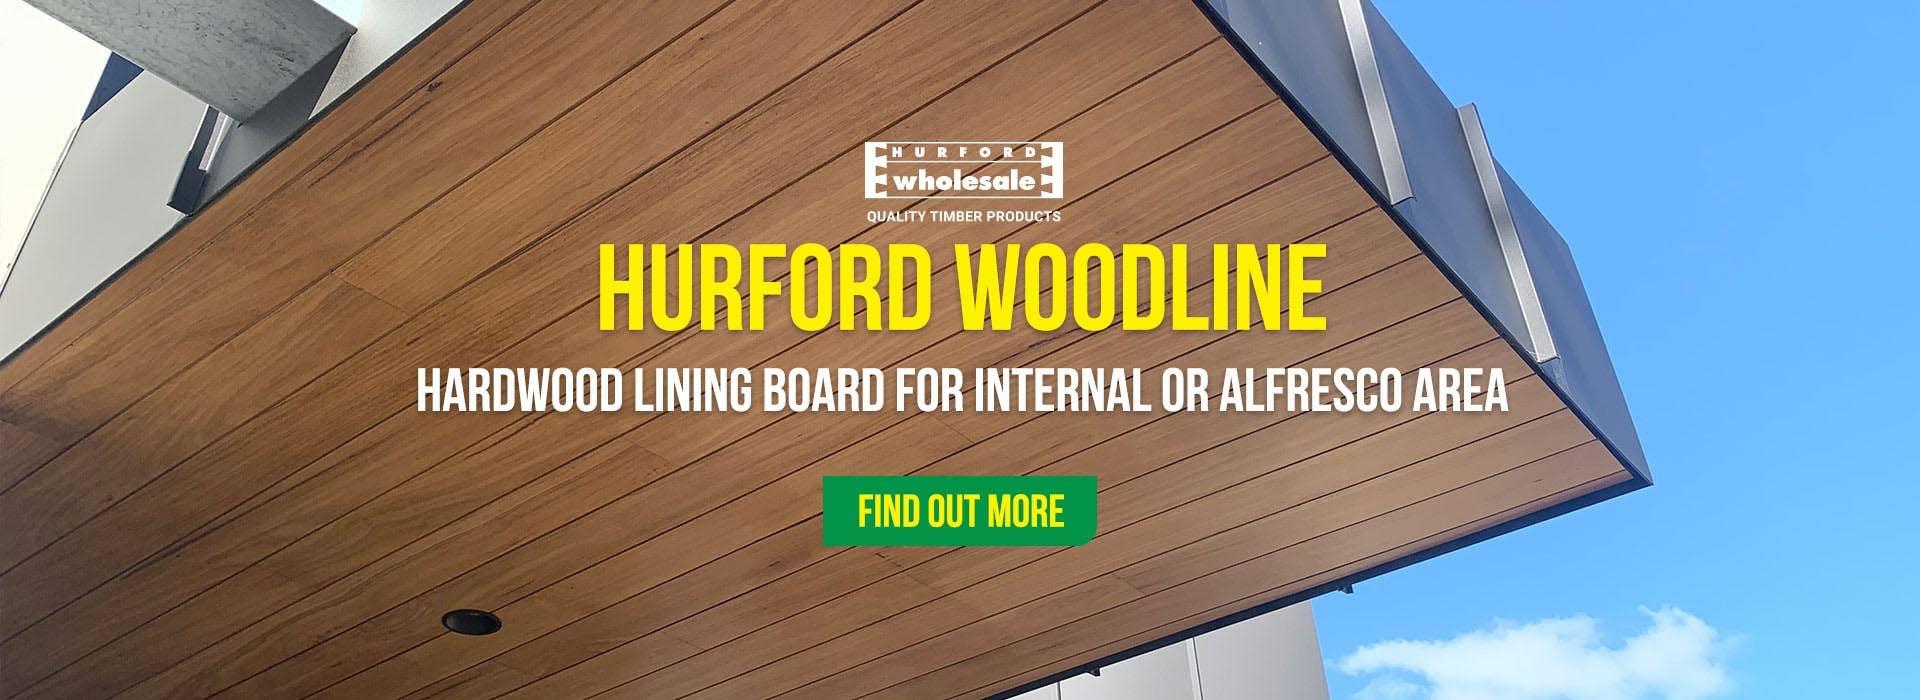 Hurford Woodline